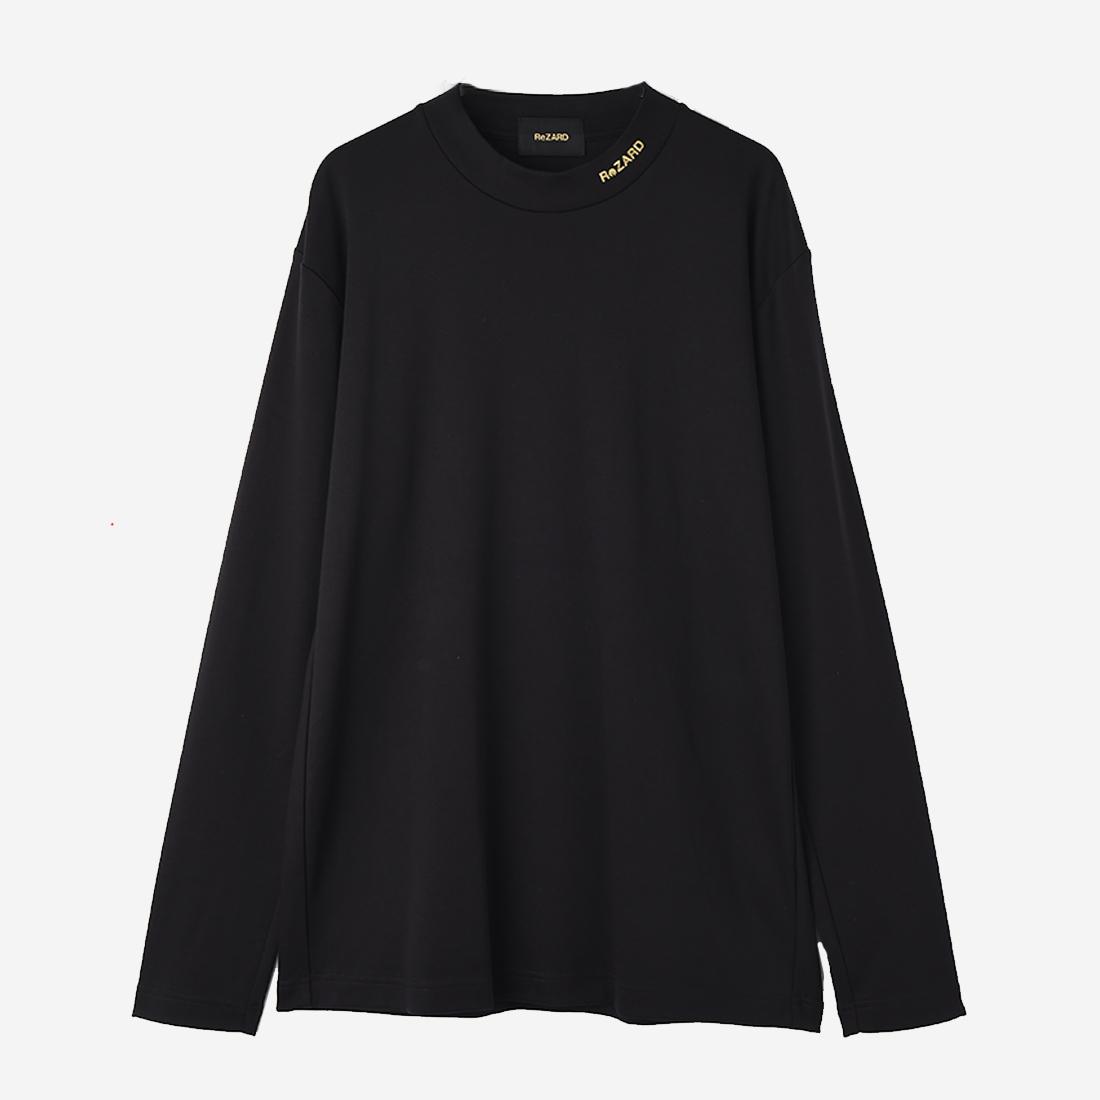 【ReZARD】Mock neck Long-sleeve TEE (neck logo print)